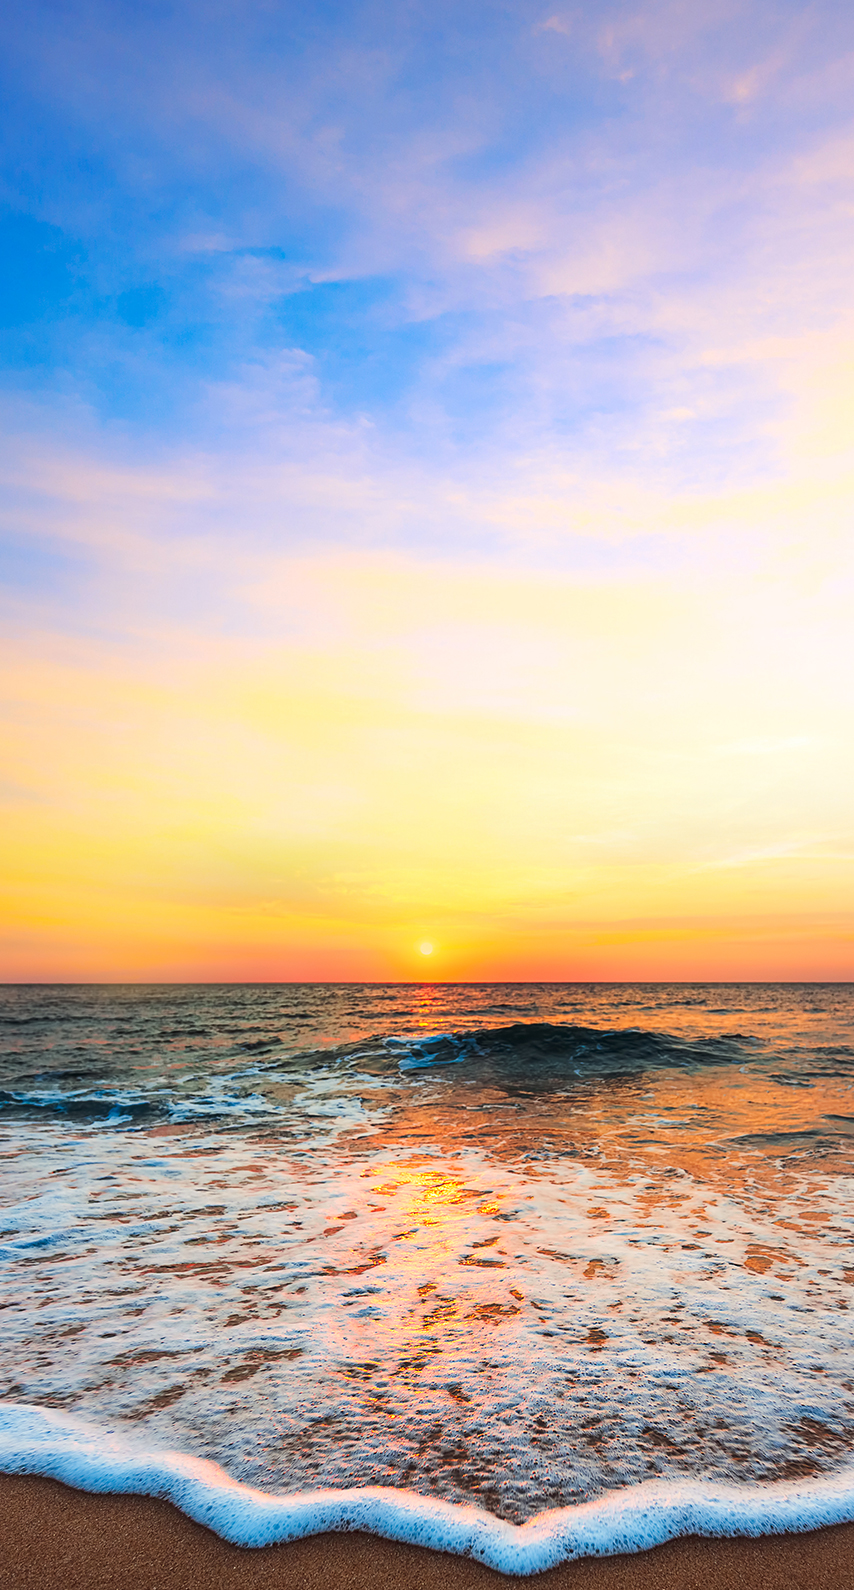 wave, sand